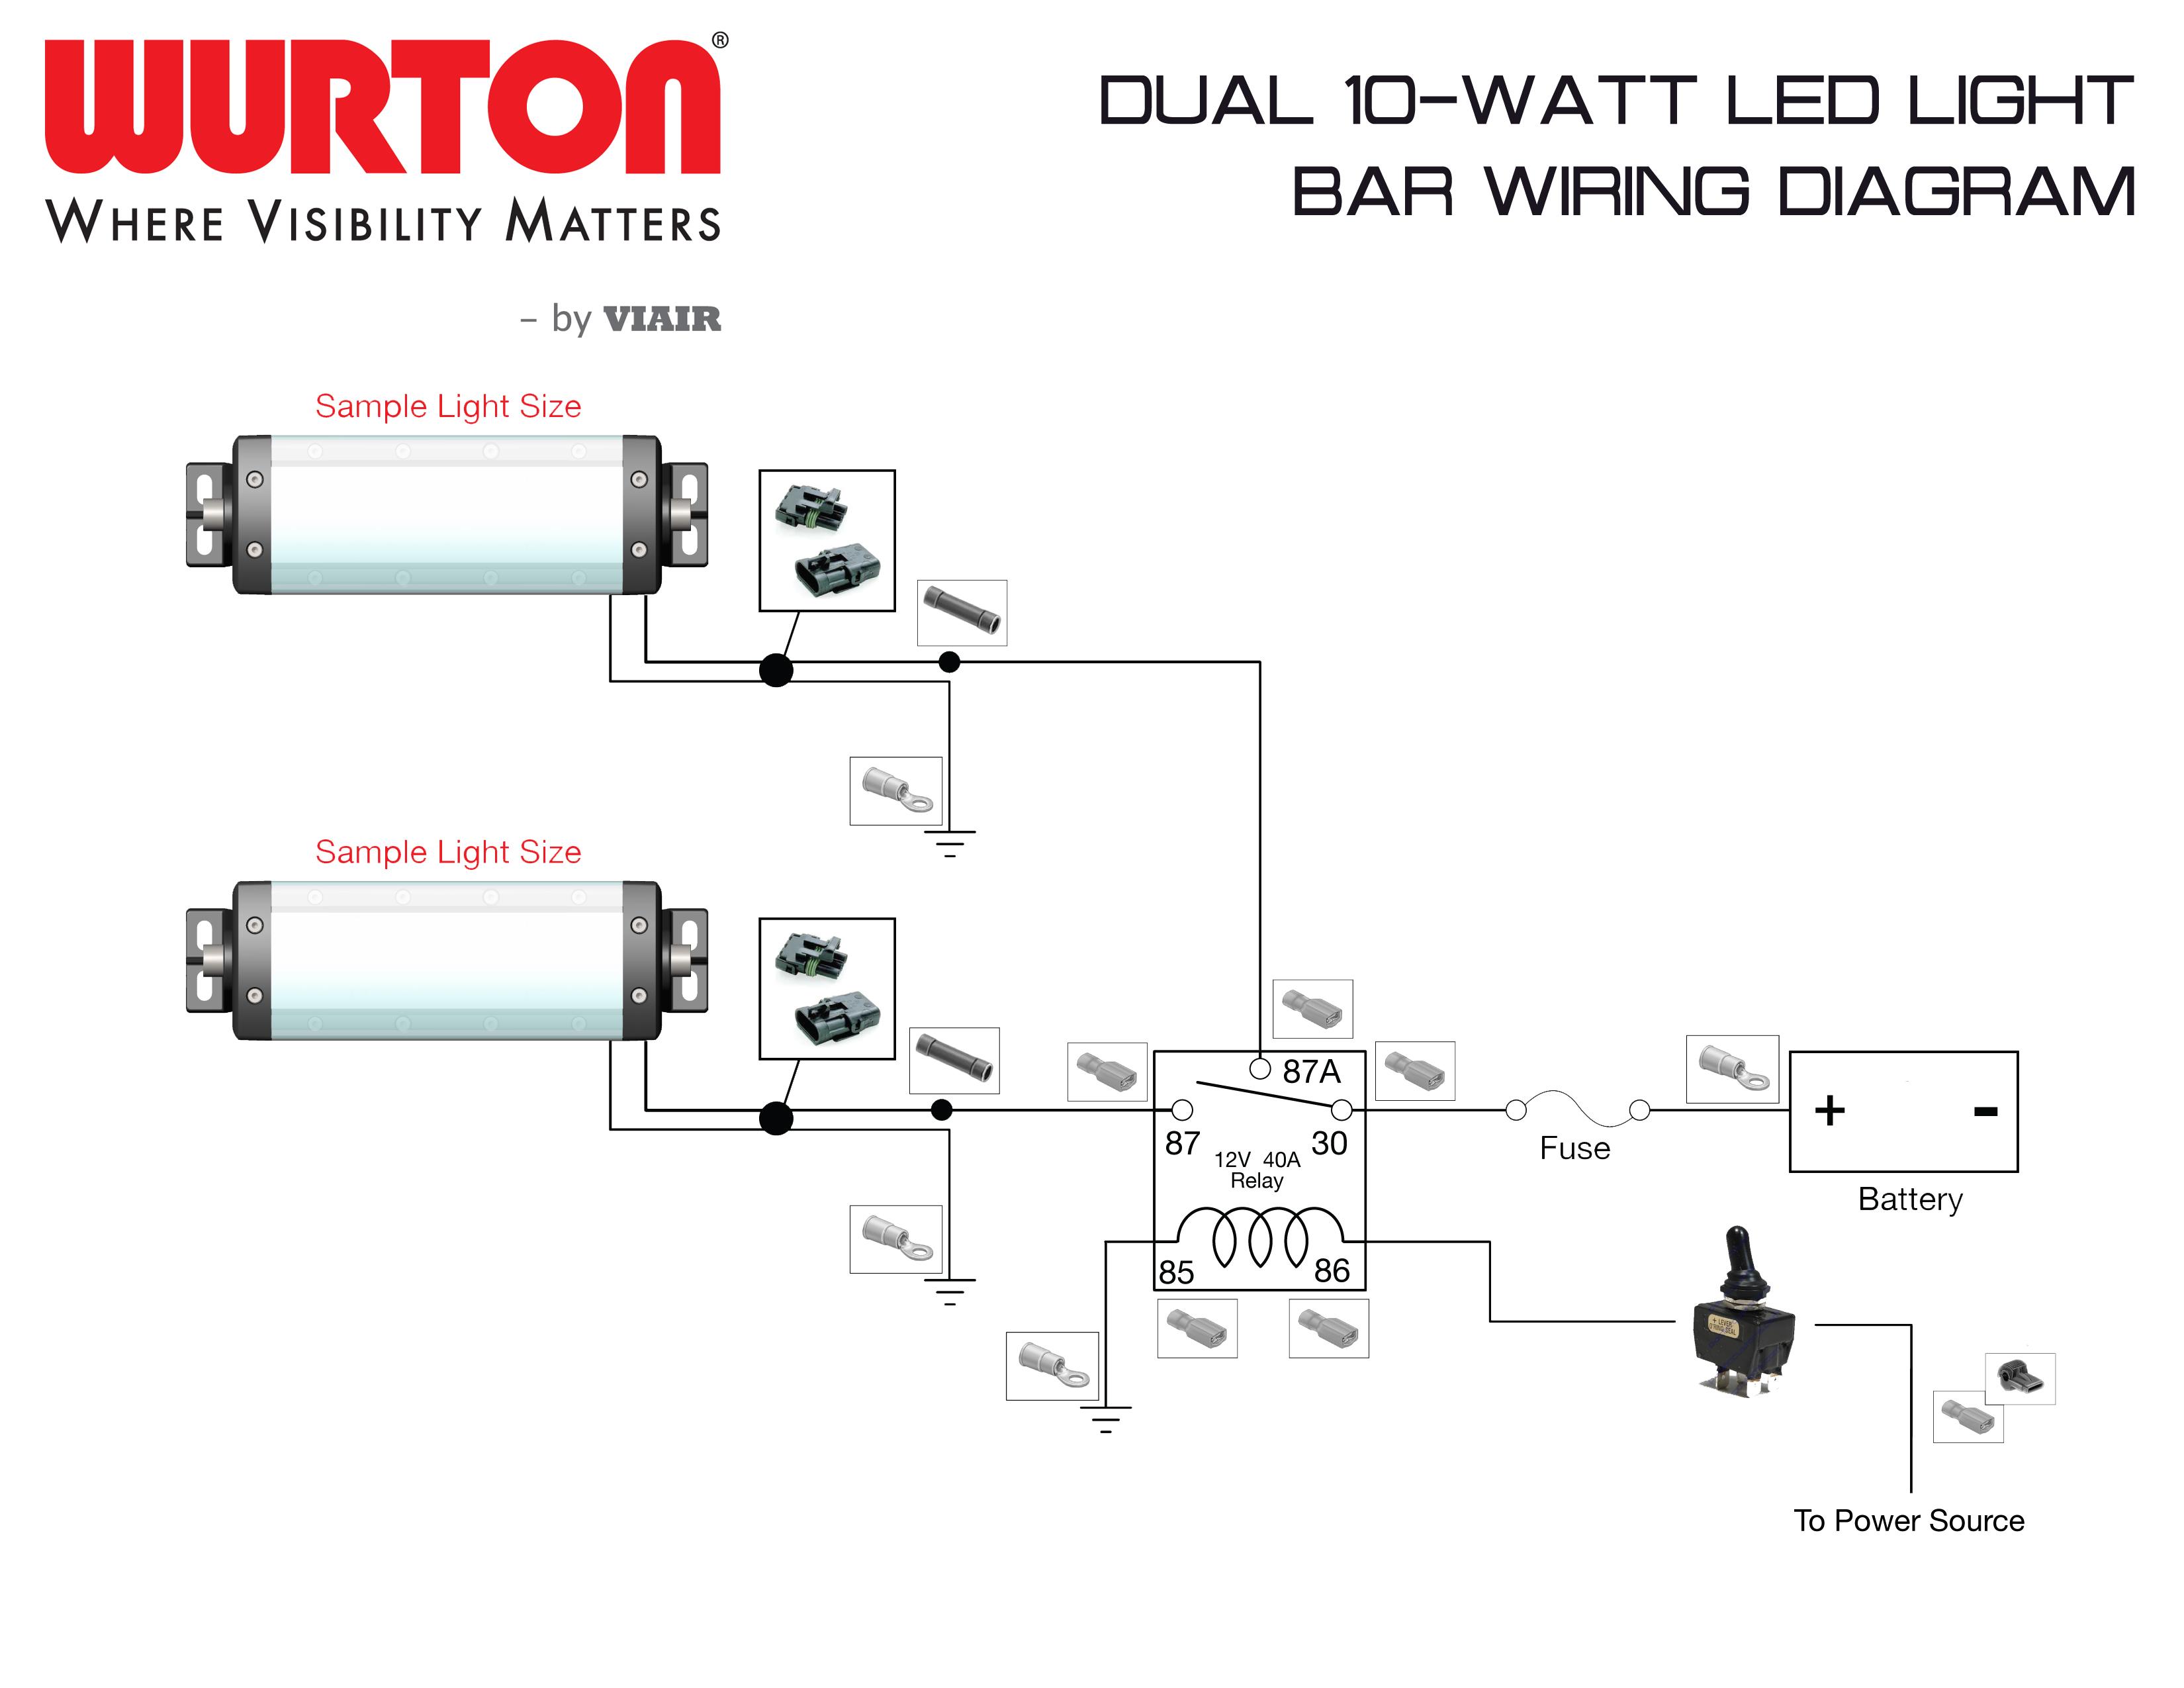 light bar wire diagram manual e books led light bar wiringlight bar wire diagram manual e books \u2013 led light bar wiring harness diagram